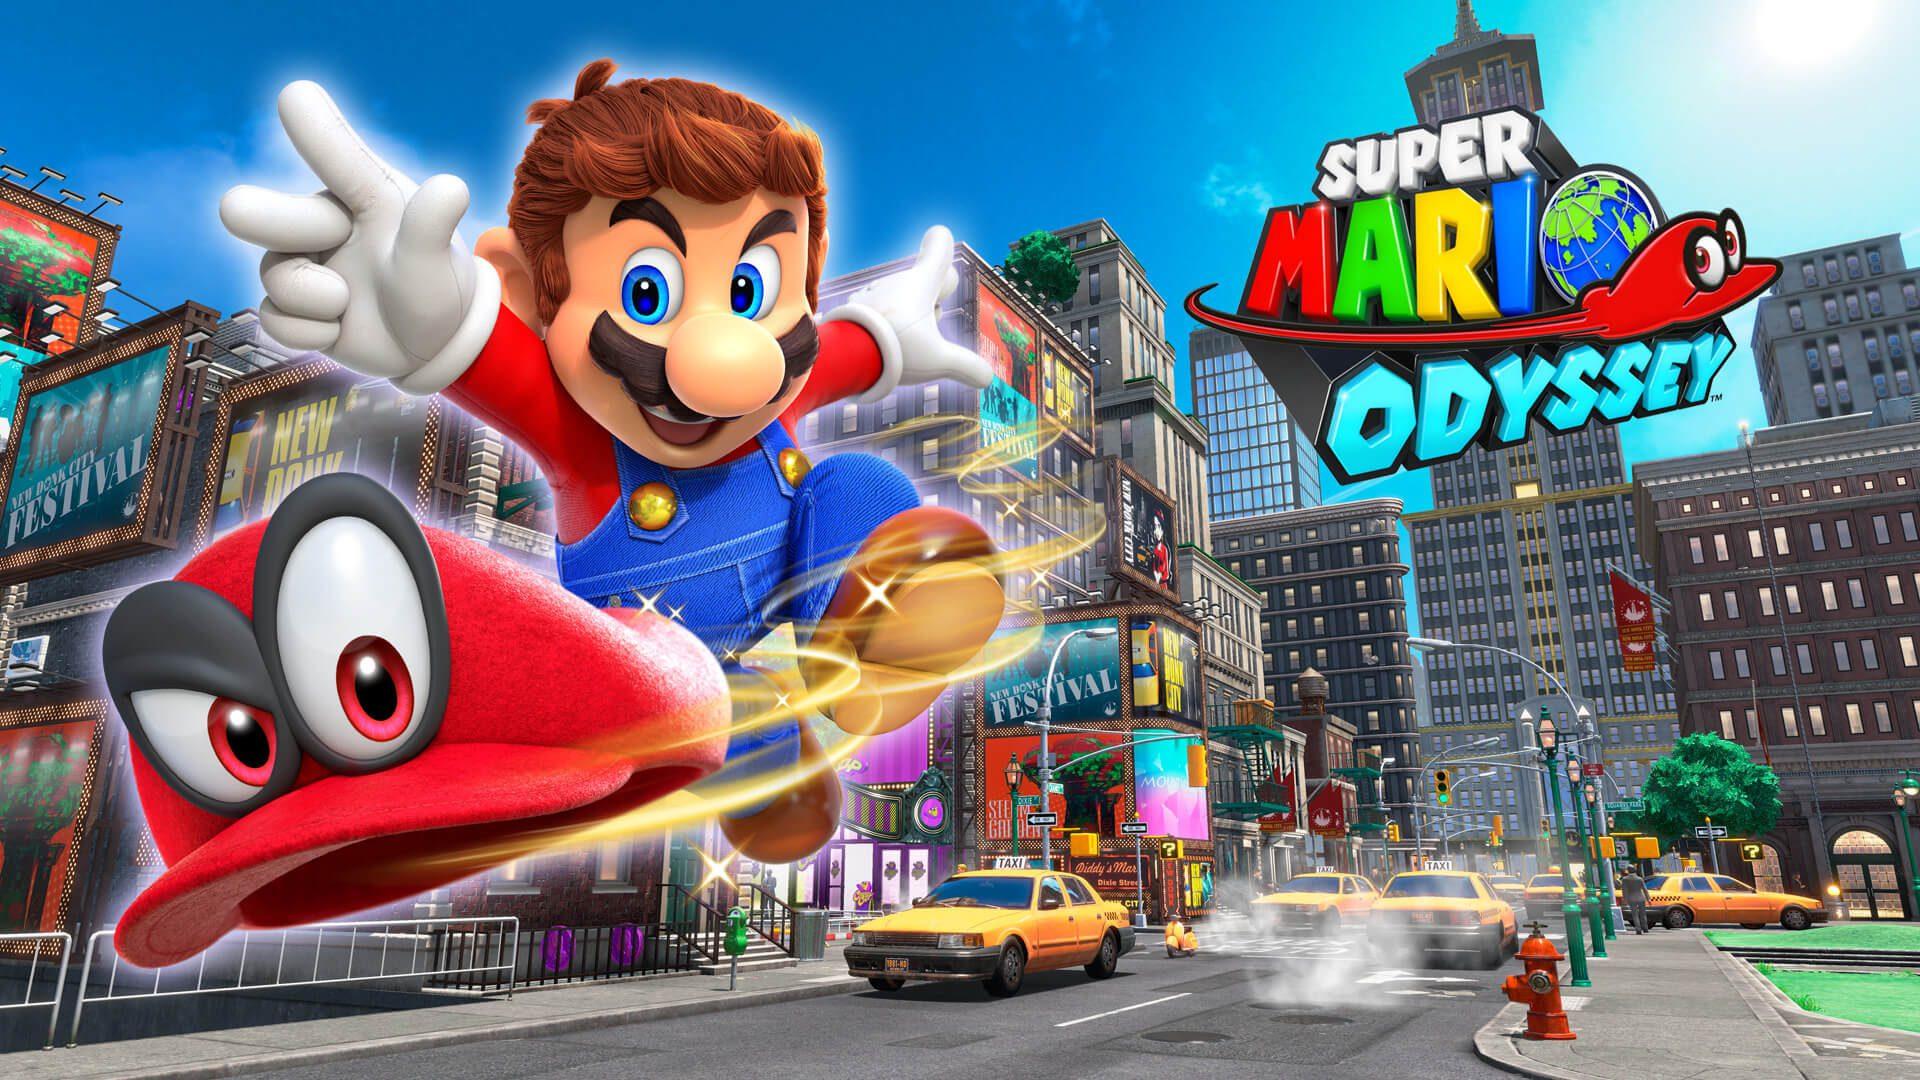 Nintendo Switch Emulator Yuzu receives multi-core update, huge improvement in performance for many games